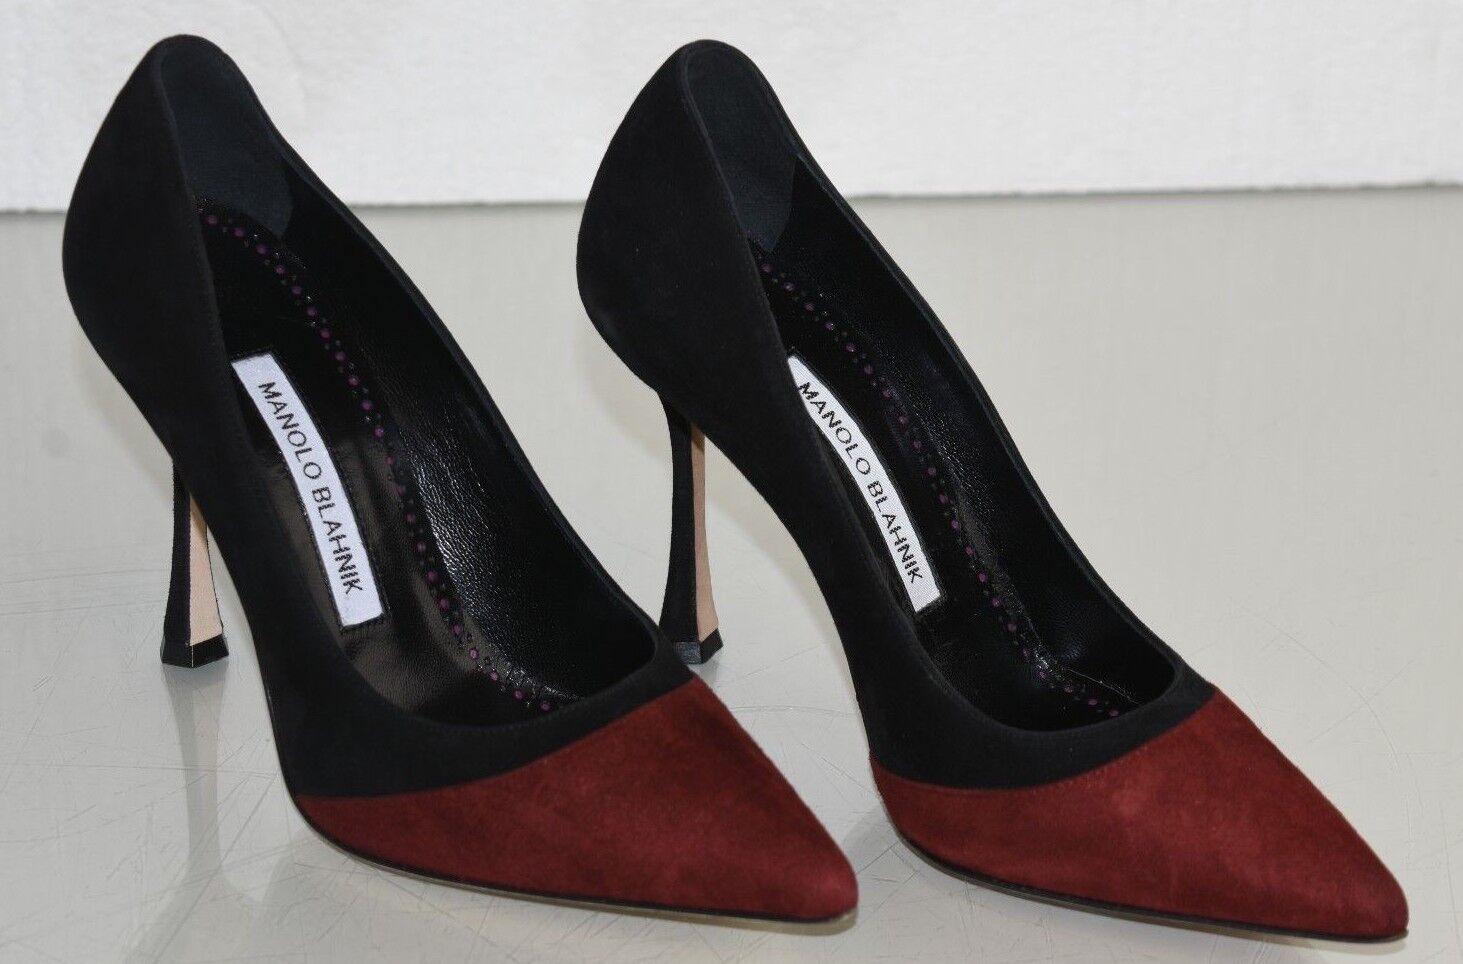 825 NEW Manolo Blahnik BILANDANA BB Black Wine Burgundy Suede shoes 35 40.5 41.